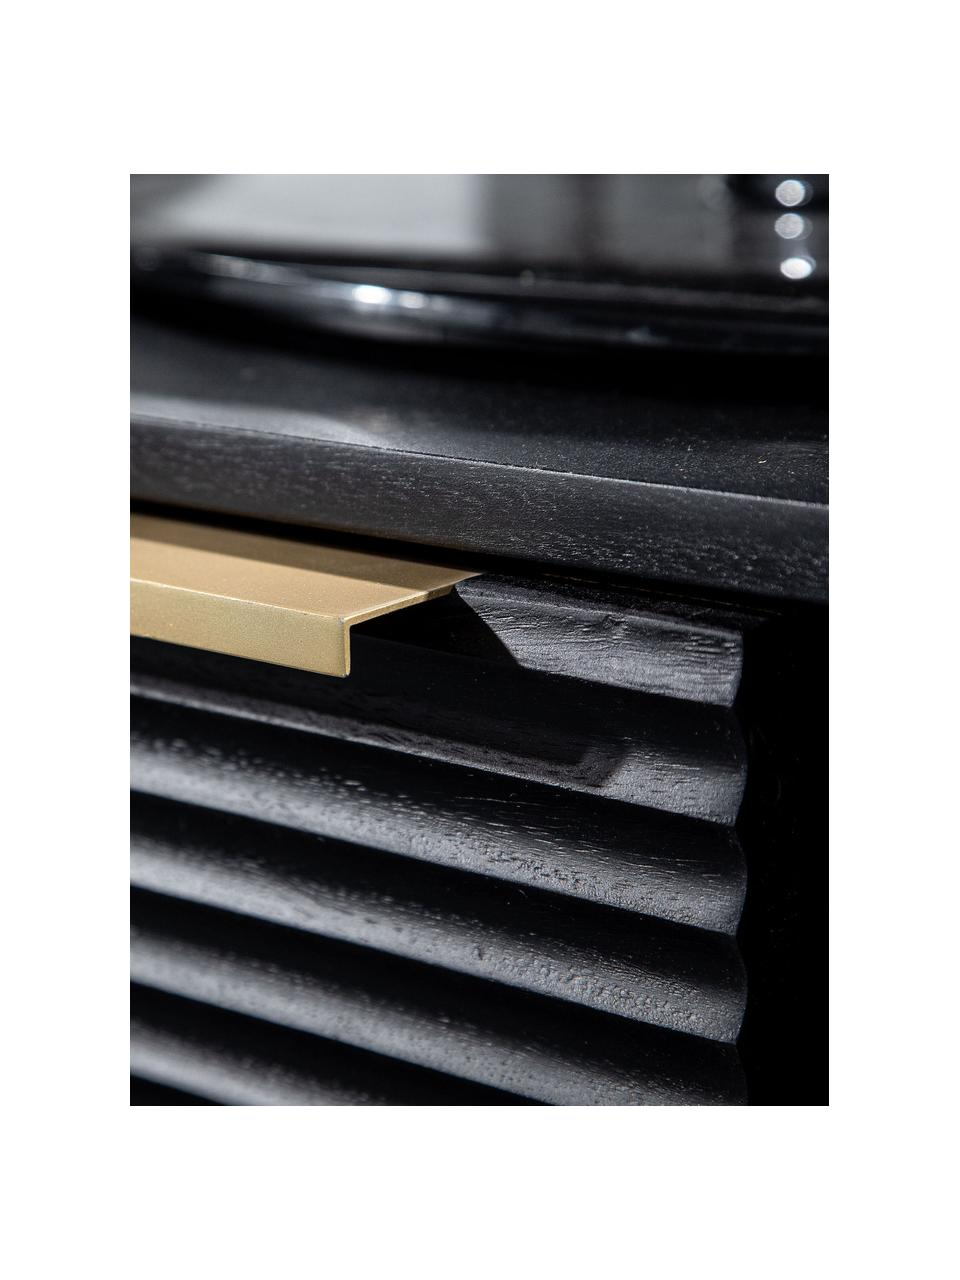 Akazienholz-Lowboard Mamba mit geriffelter Front, Korpus: Akazienholz, lackiert, Beine: Metall, lackiert, Schwarz, 158 x 50 cm